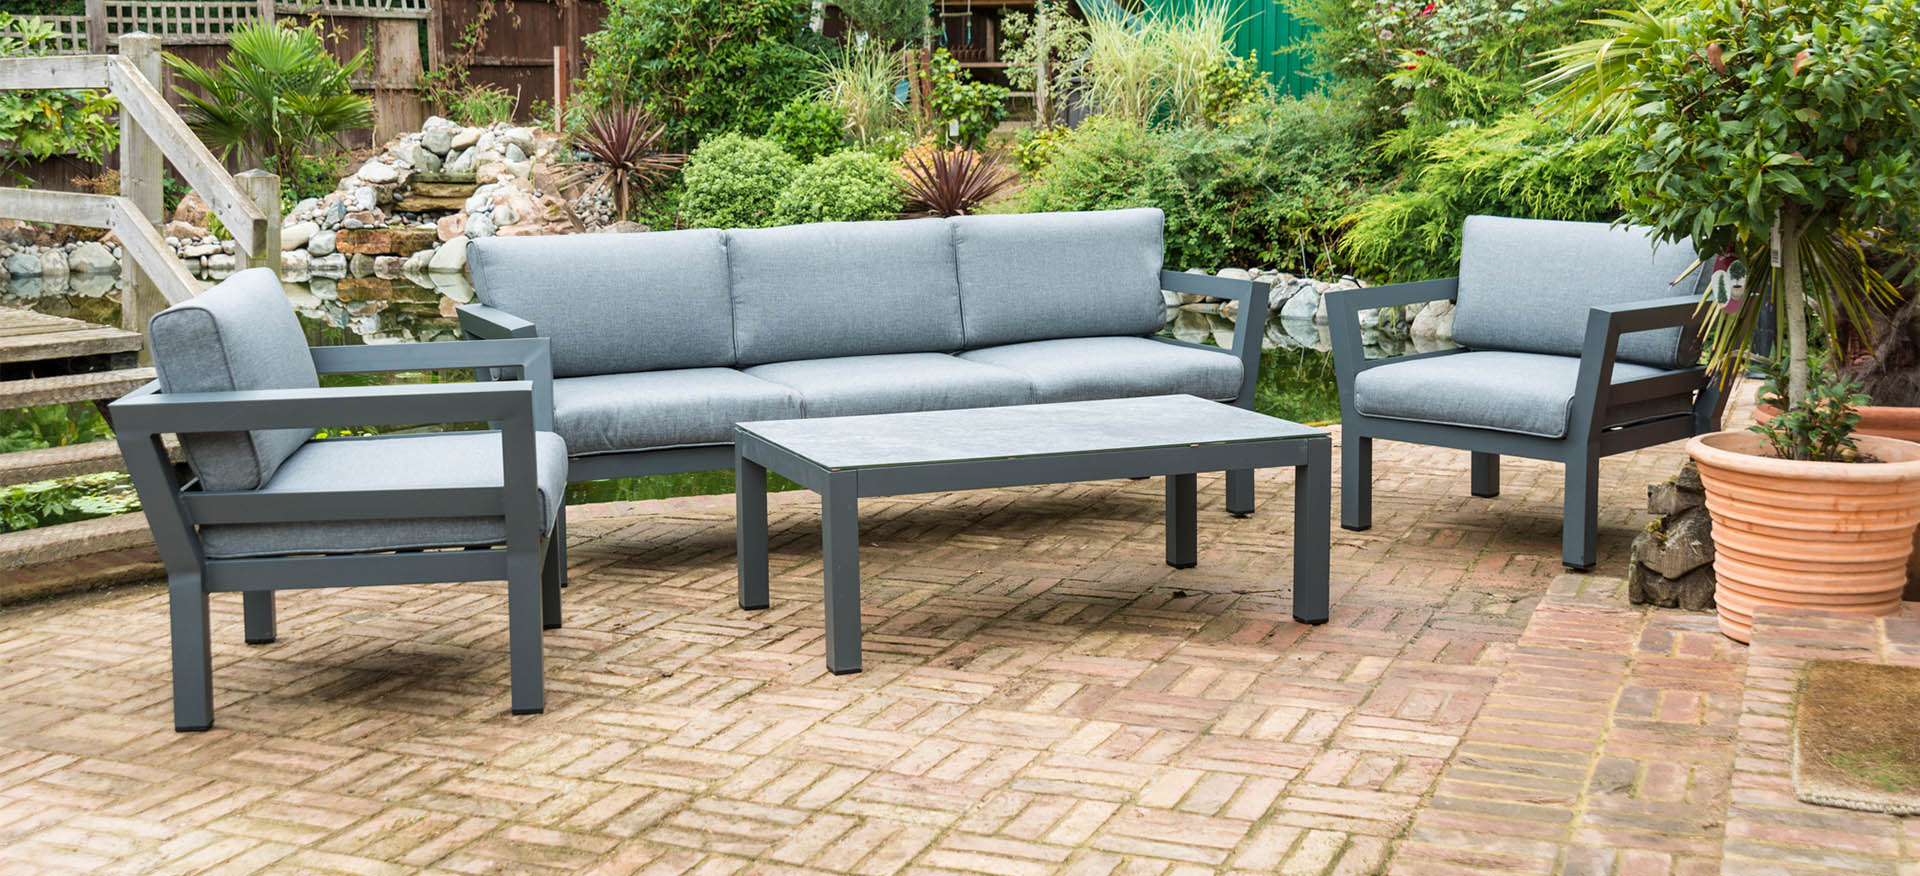 Henley 3 Seat Sofa Set